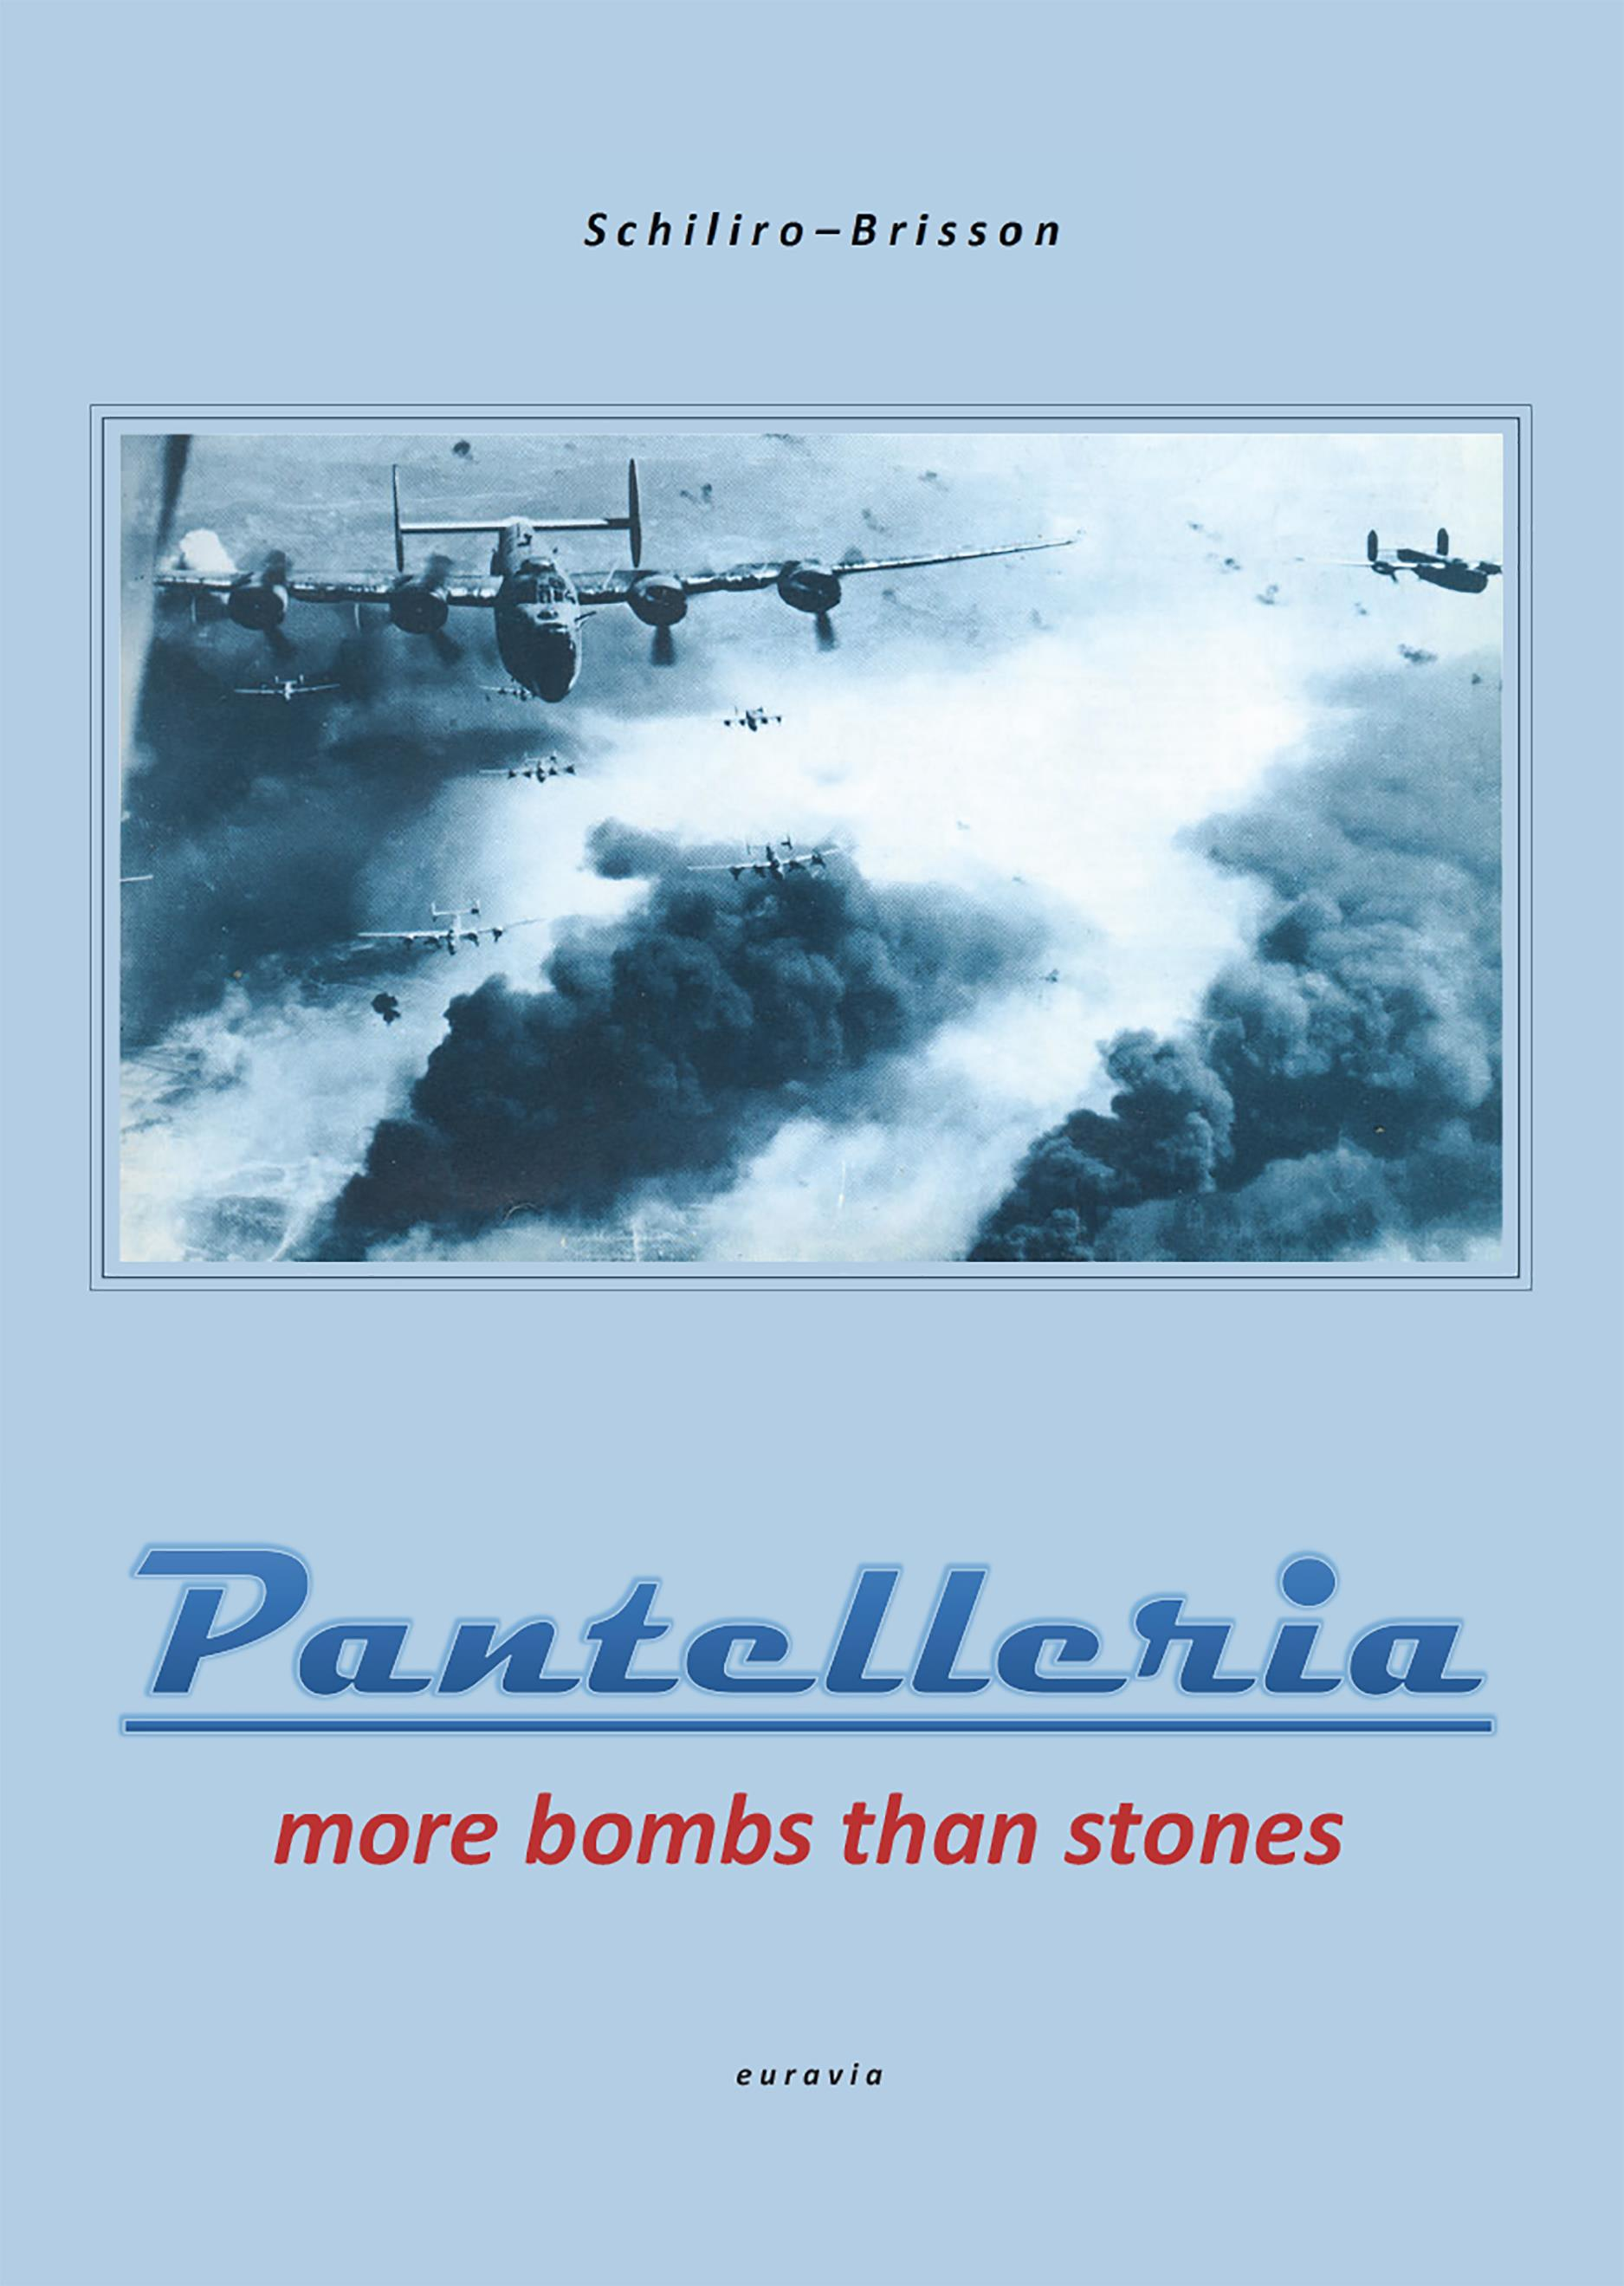 PANTELLERIA - More bombs than stones